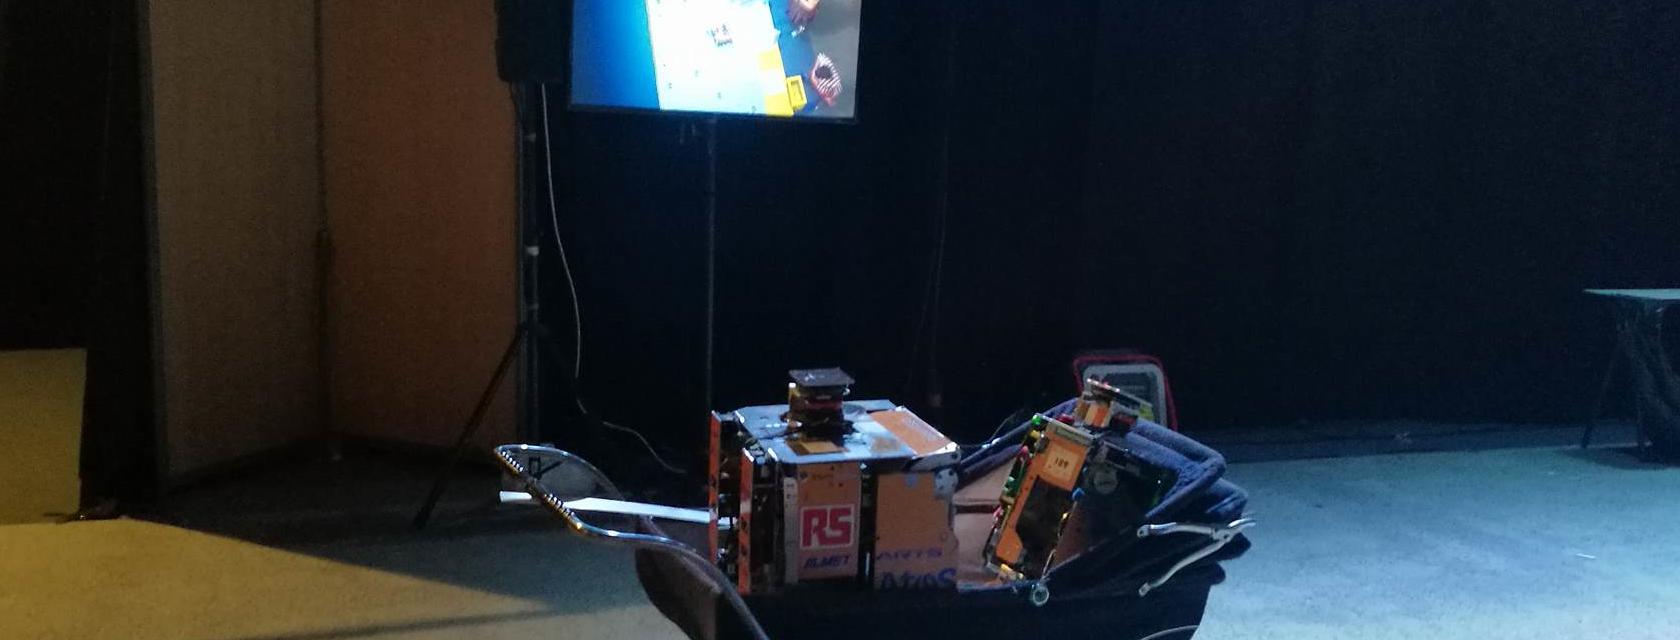 Nos robots, en repos après un match !